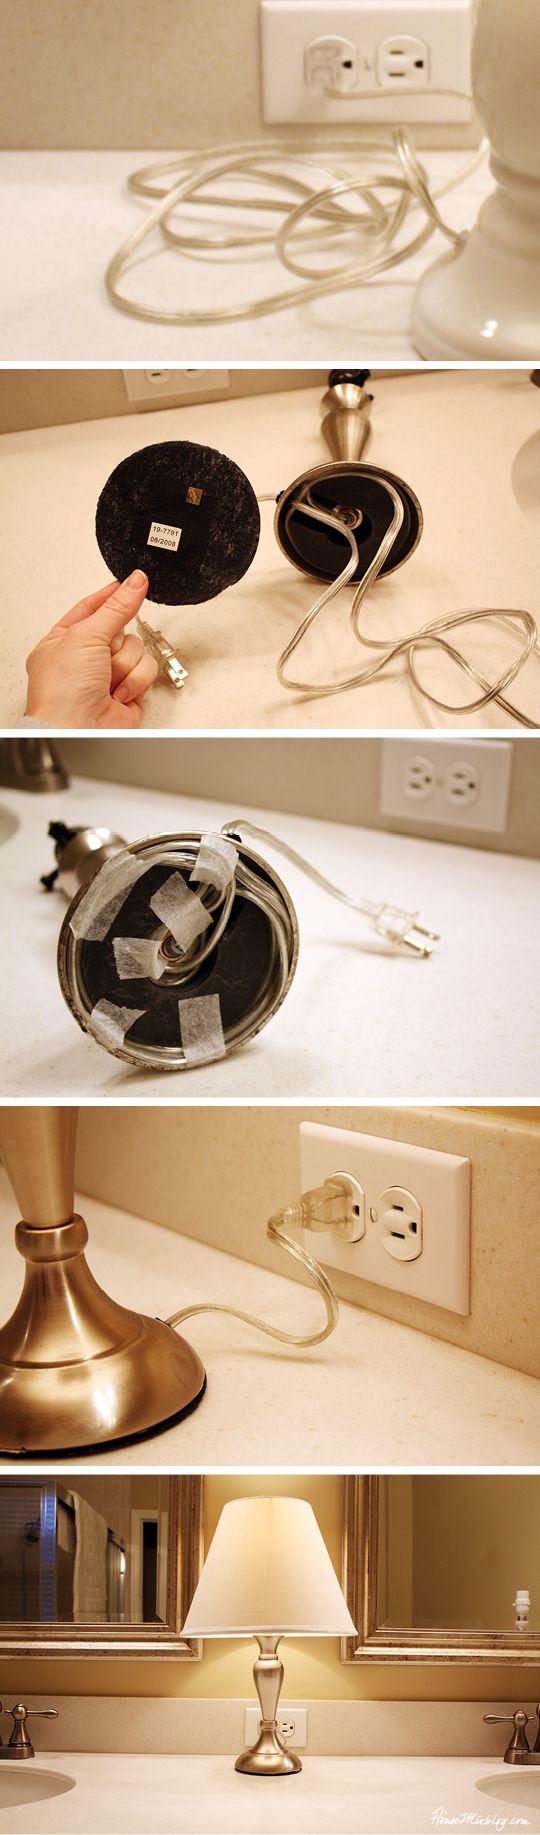 best creative ideas diy images on pinterest bedroom ideas